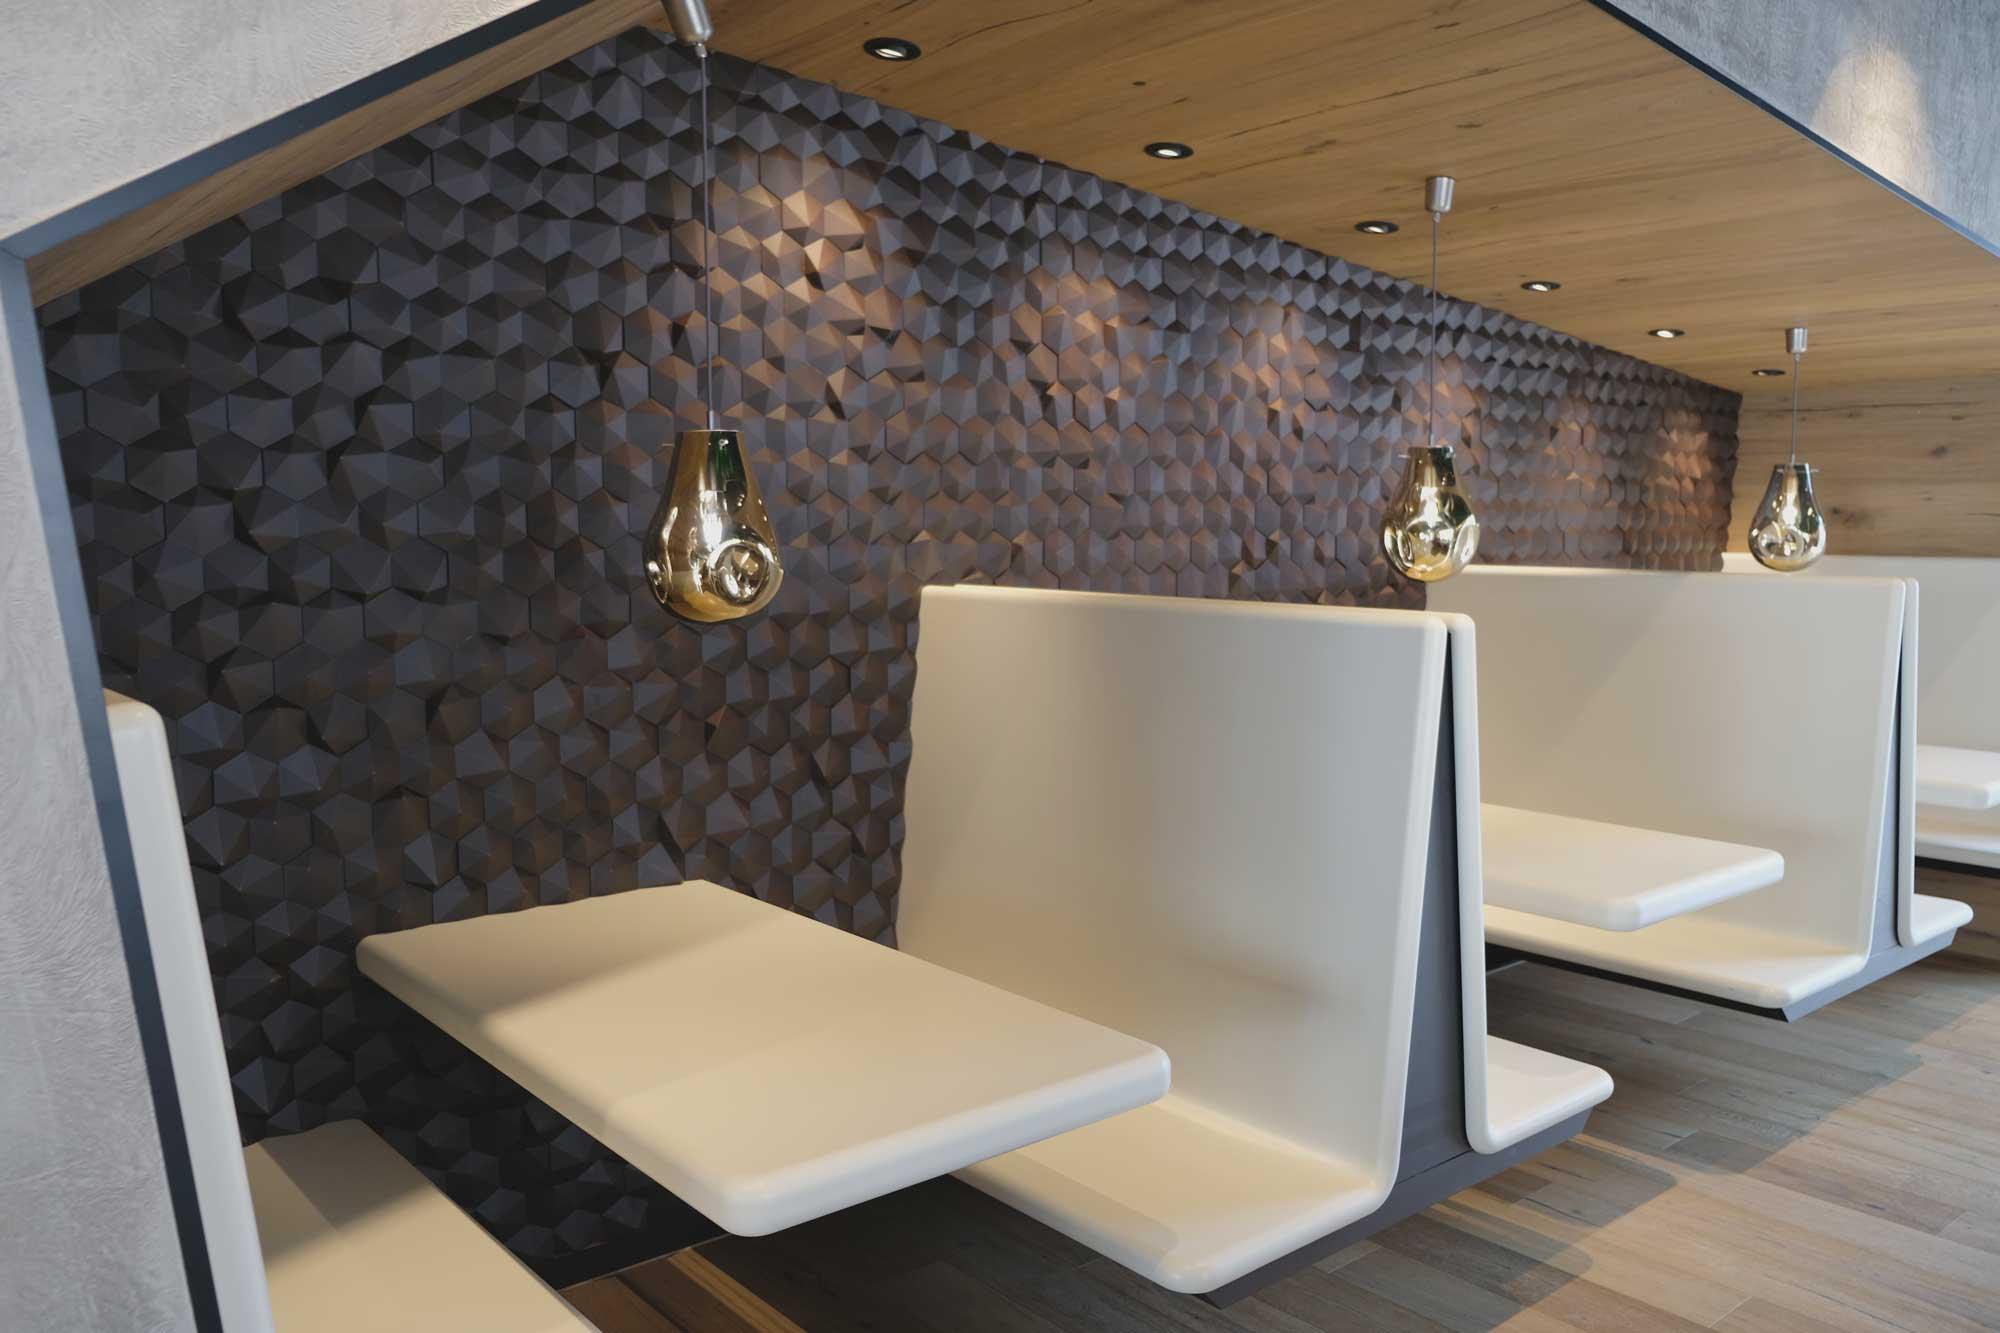 Kaffeegenuss an der Wand - Impressionen Wandgestaltung-2